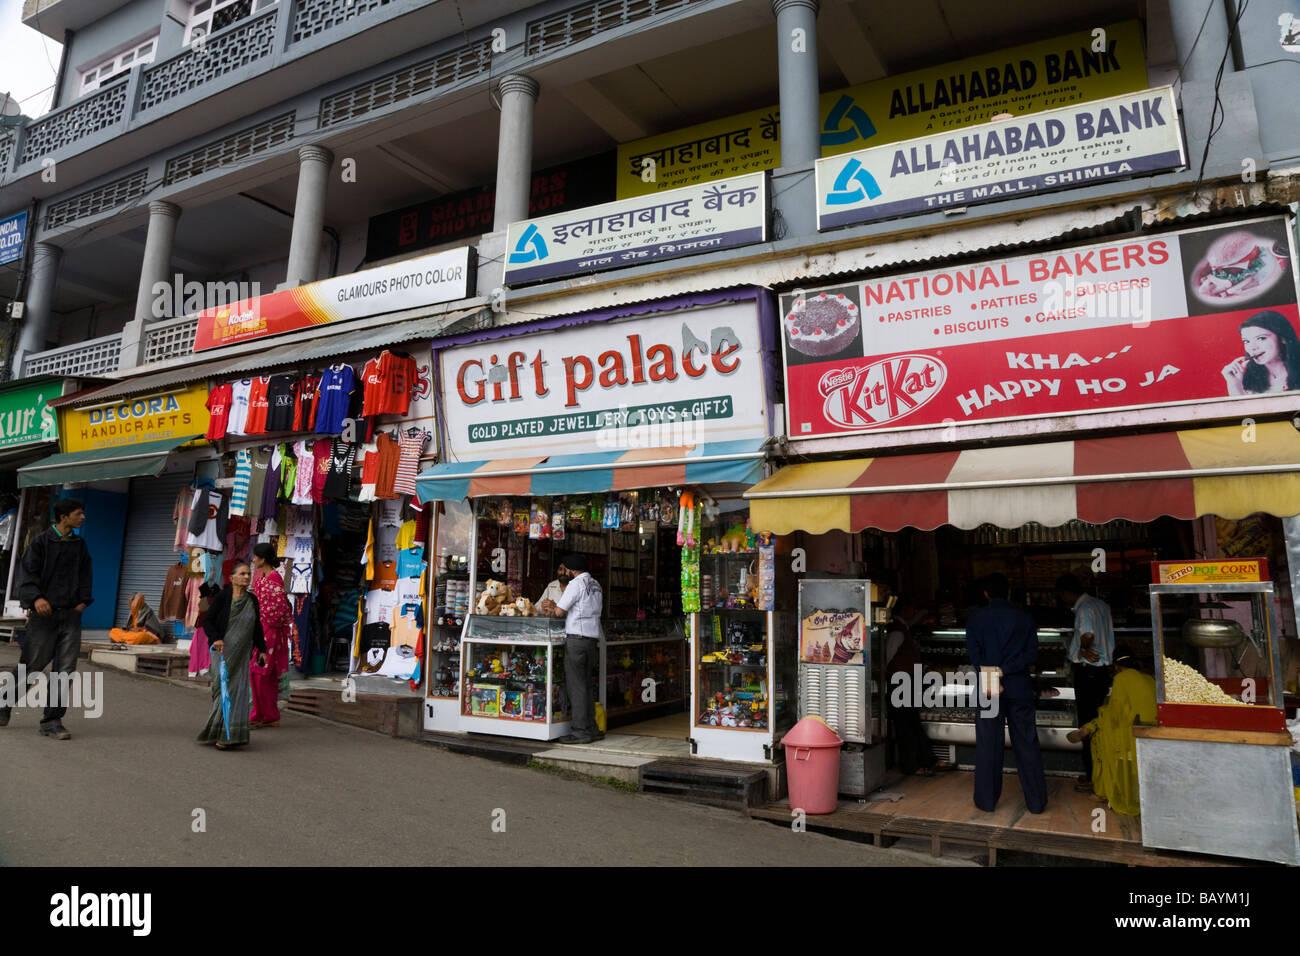 Tourist gift and souvenir shops in Shimla. Himachal Pradesh. India. - Stock Image